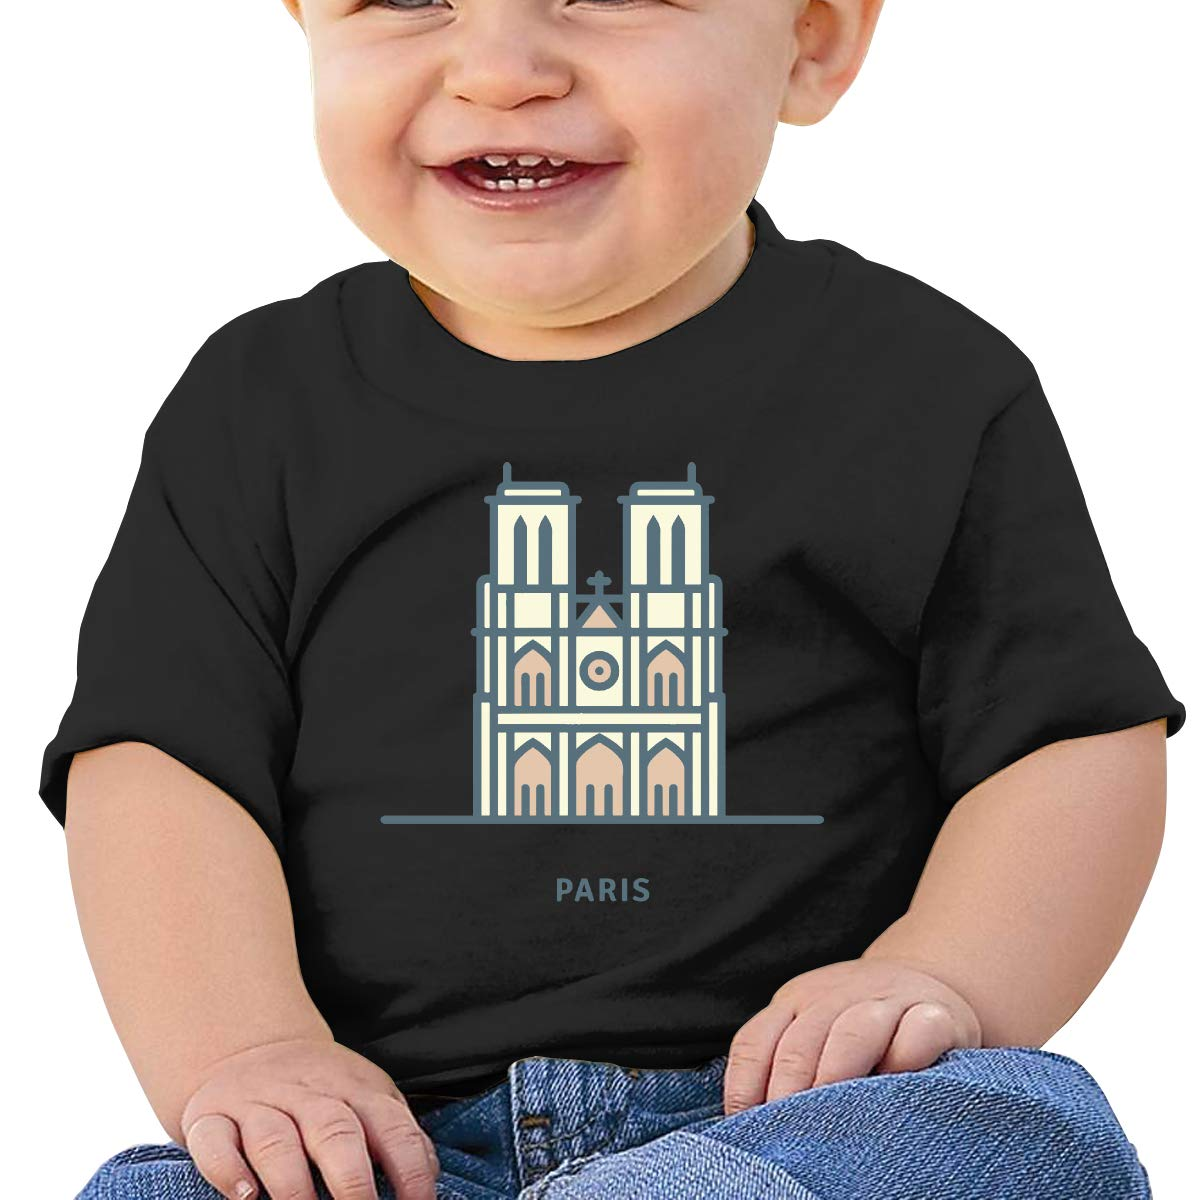 ZUGFGF-S3 Notre Dame Cathedral Paris1 Baby Girls Newborn Short Sleeve Tee Shirt 6-24 Month Cotton Tops